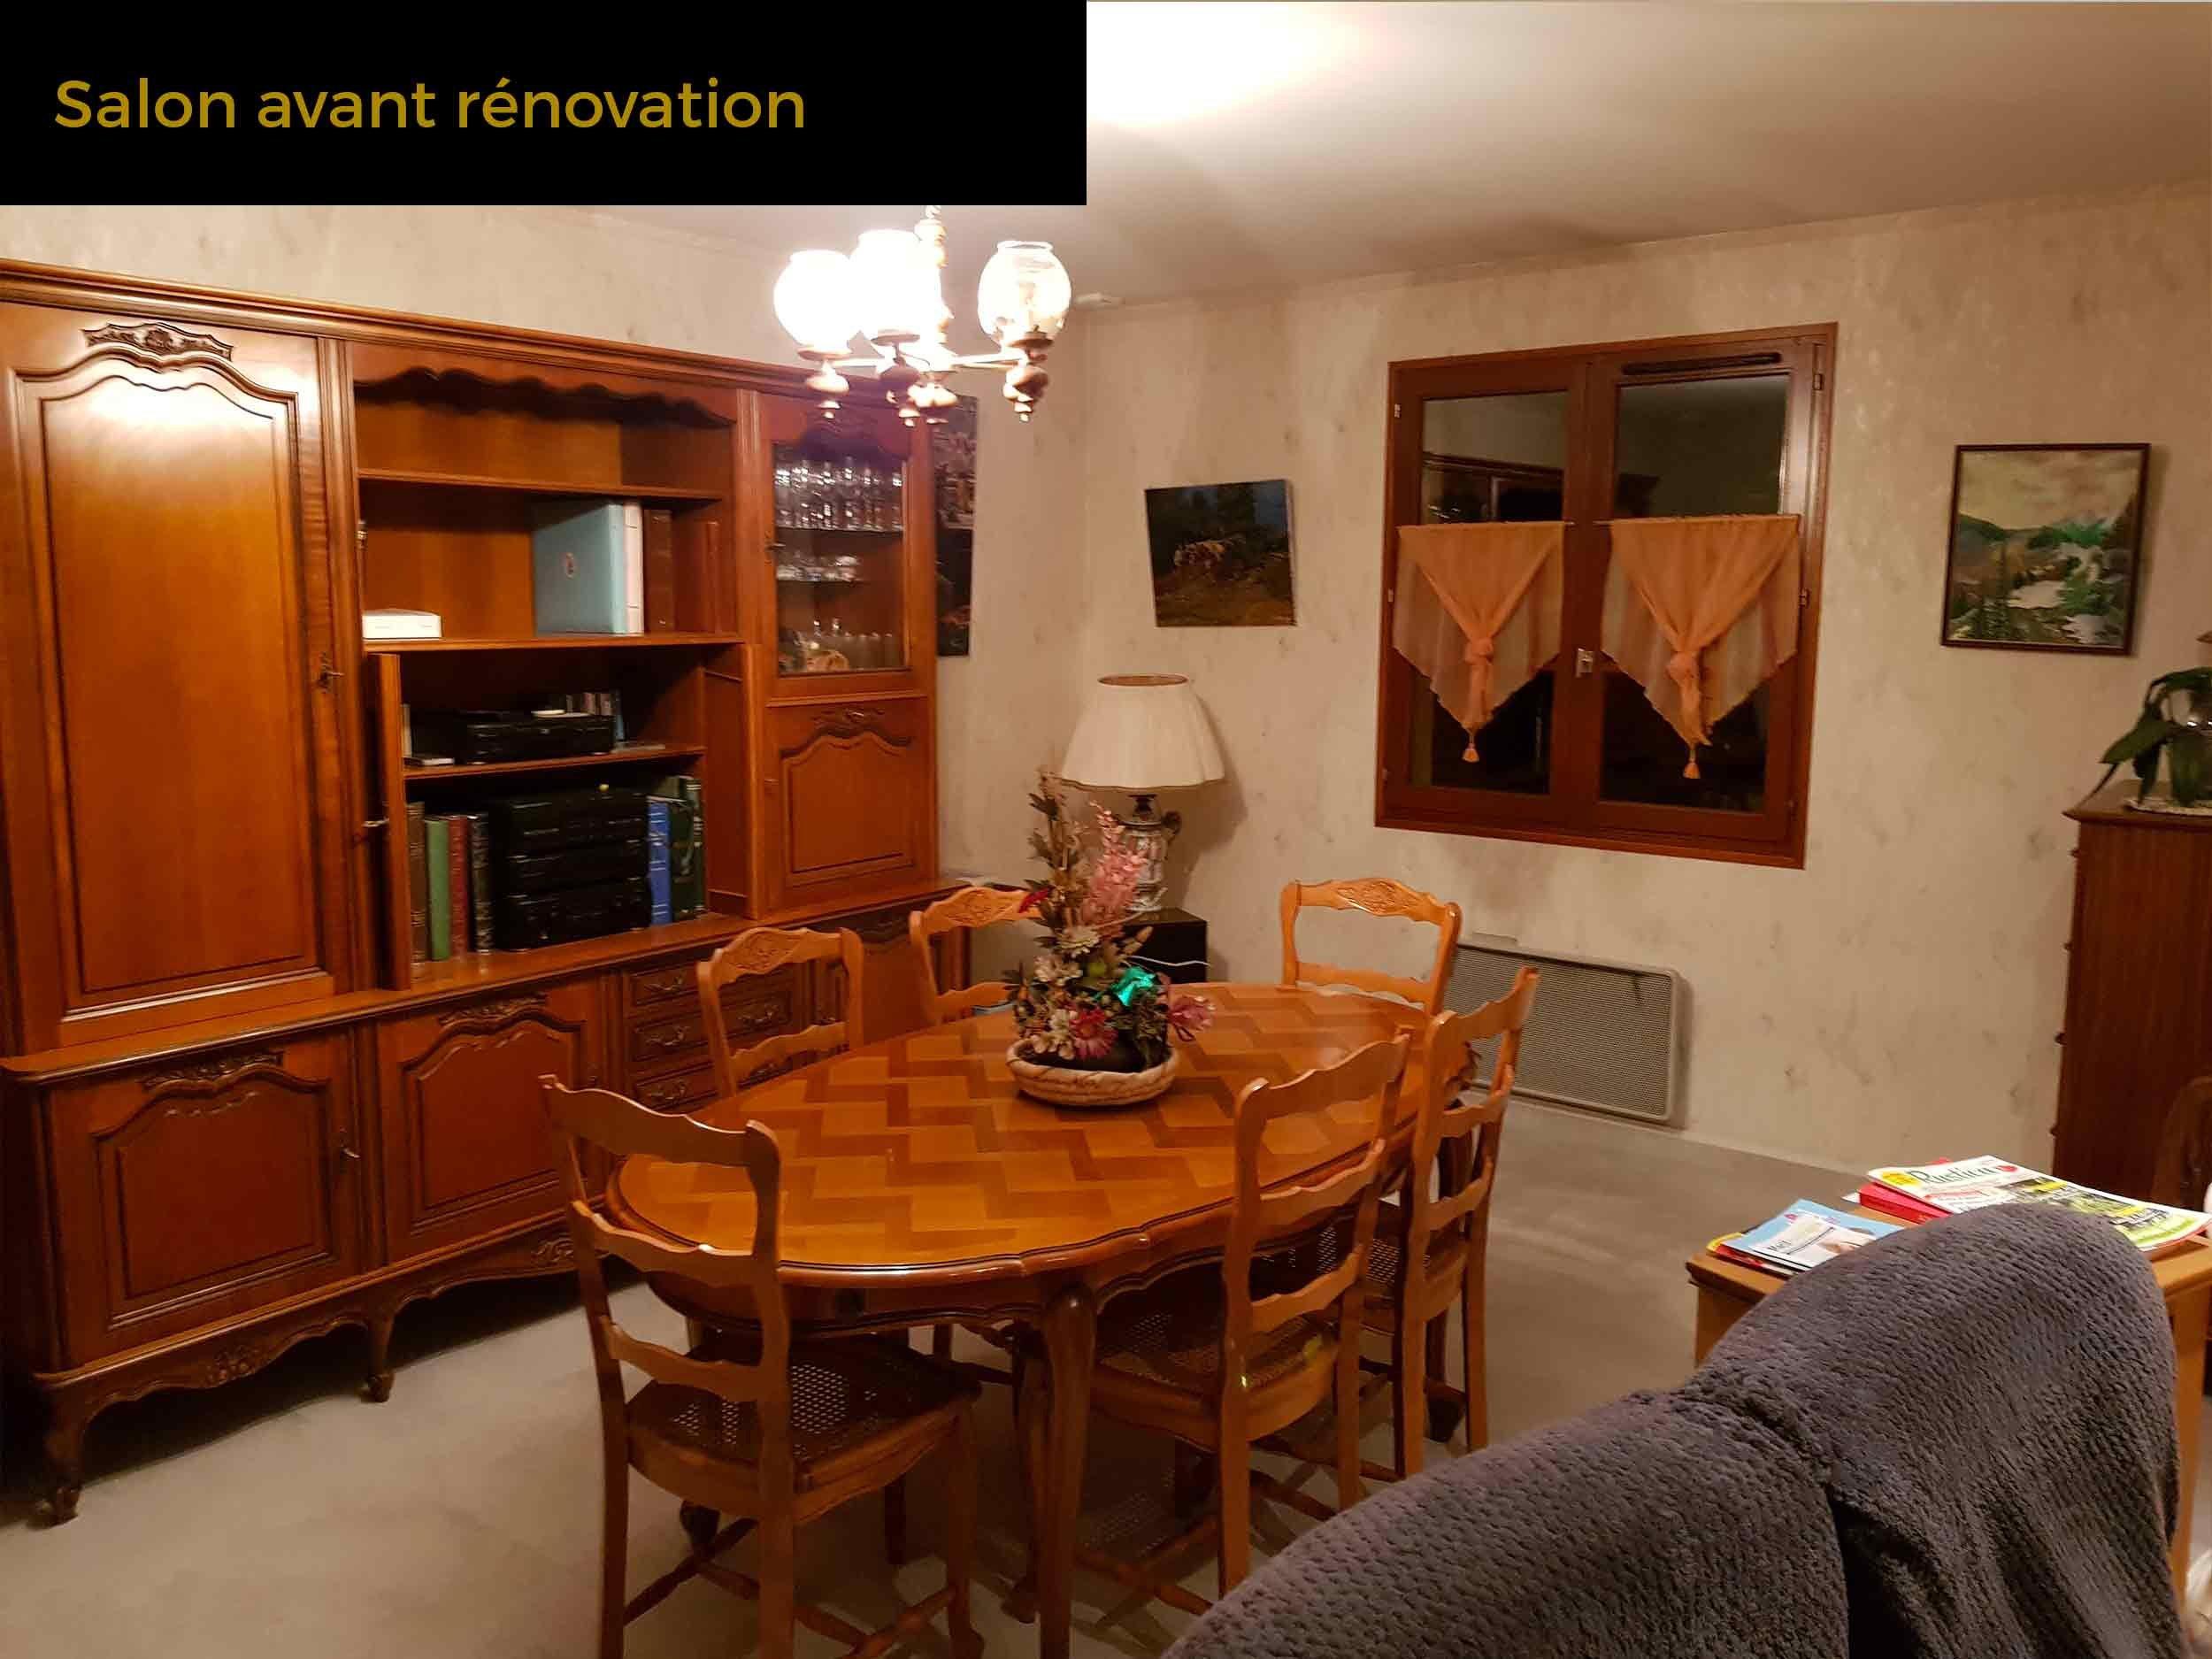 3-salon-avant-renovation-chazay-dazergues